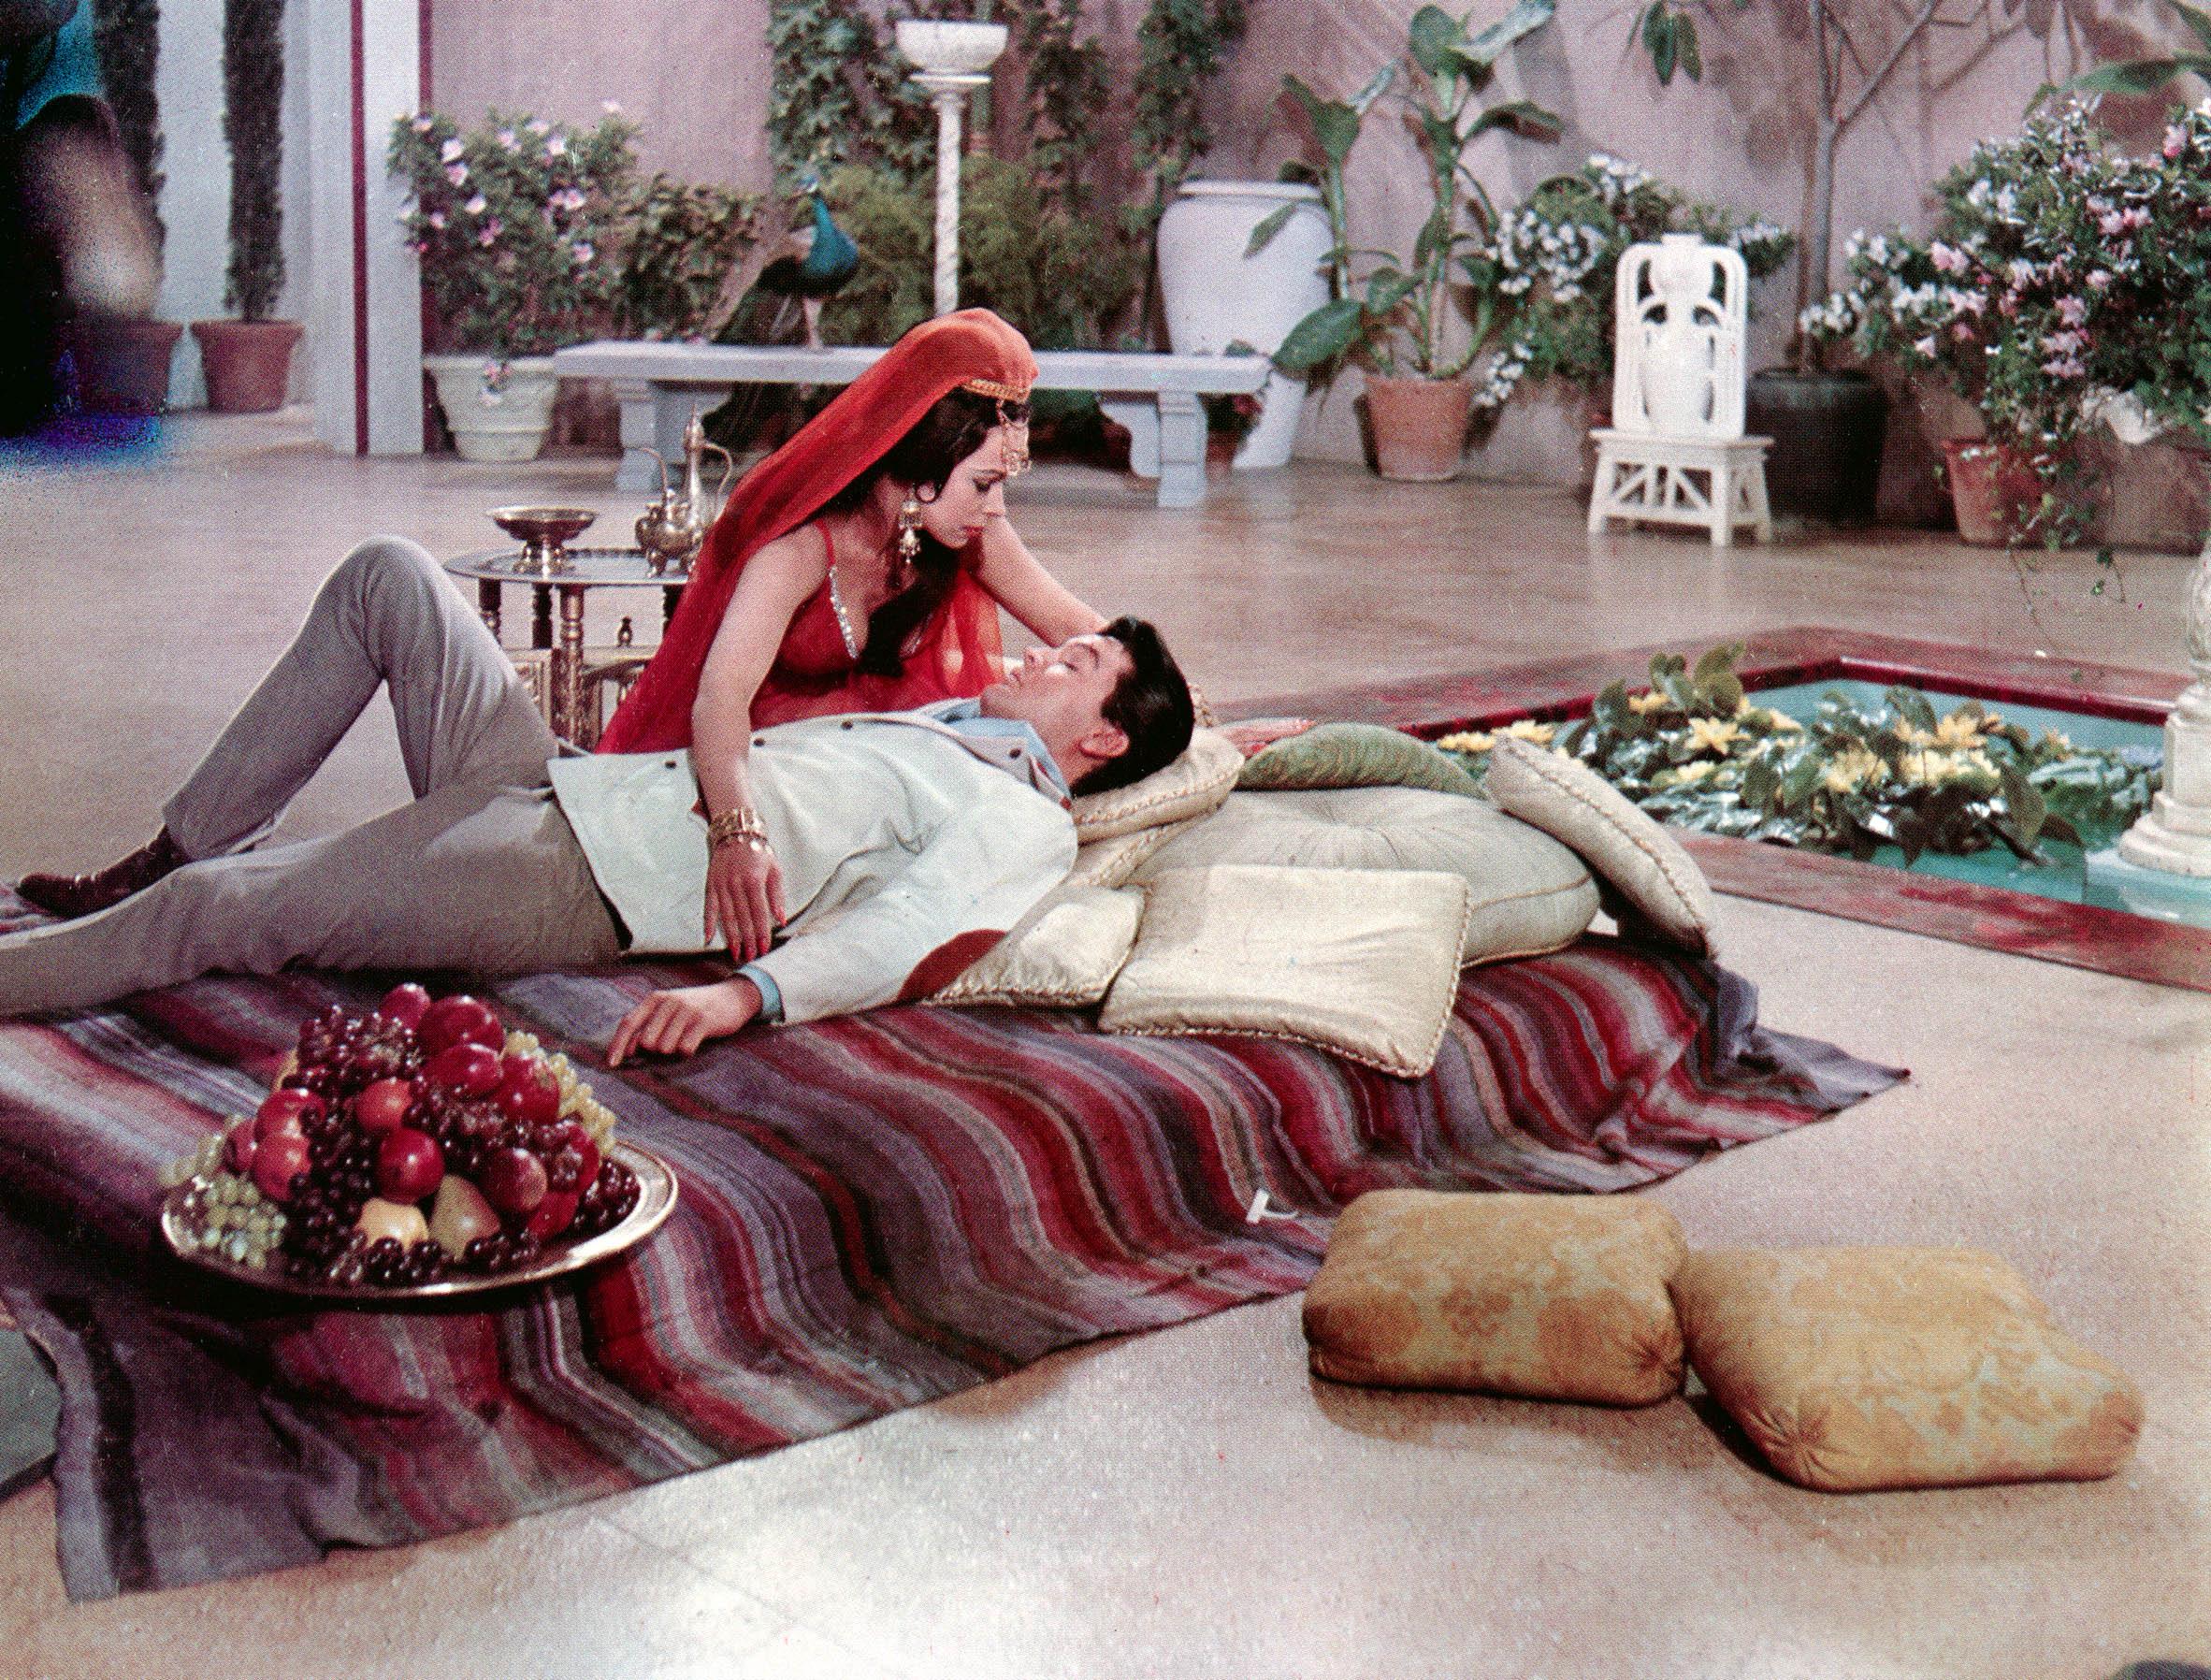 HARUM SCARUM, Mary Ann Mobley, Elvis Presley